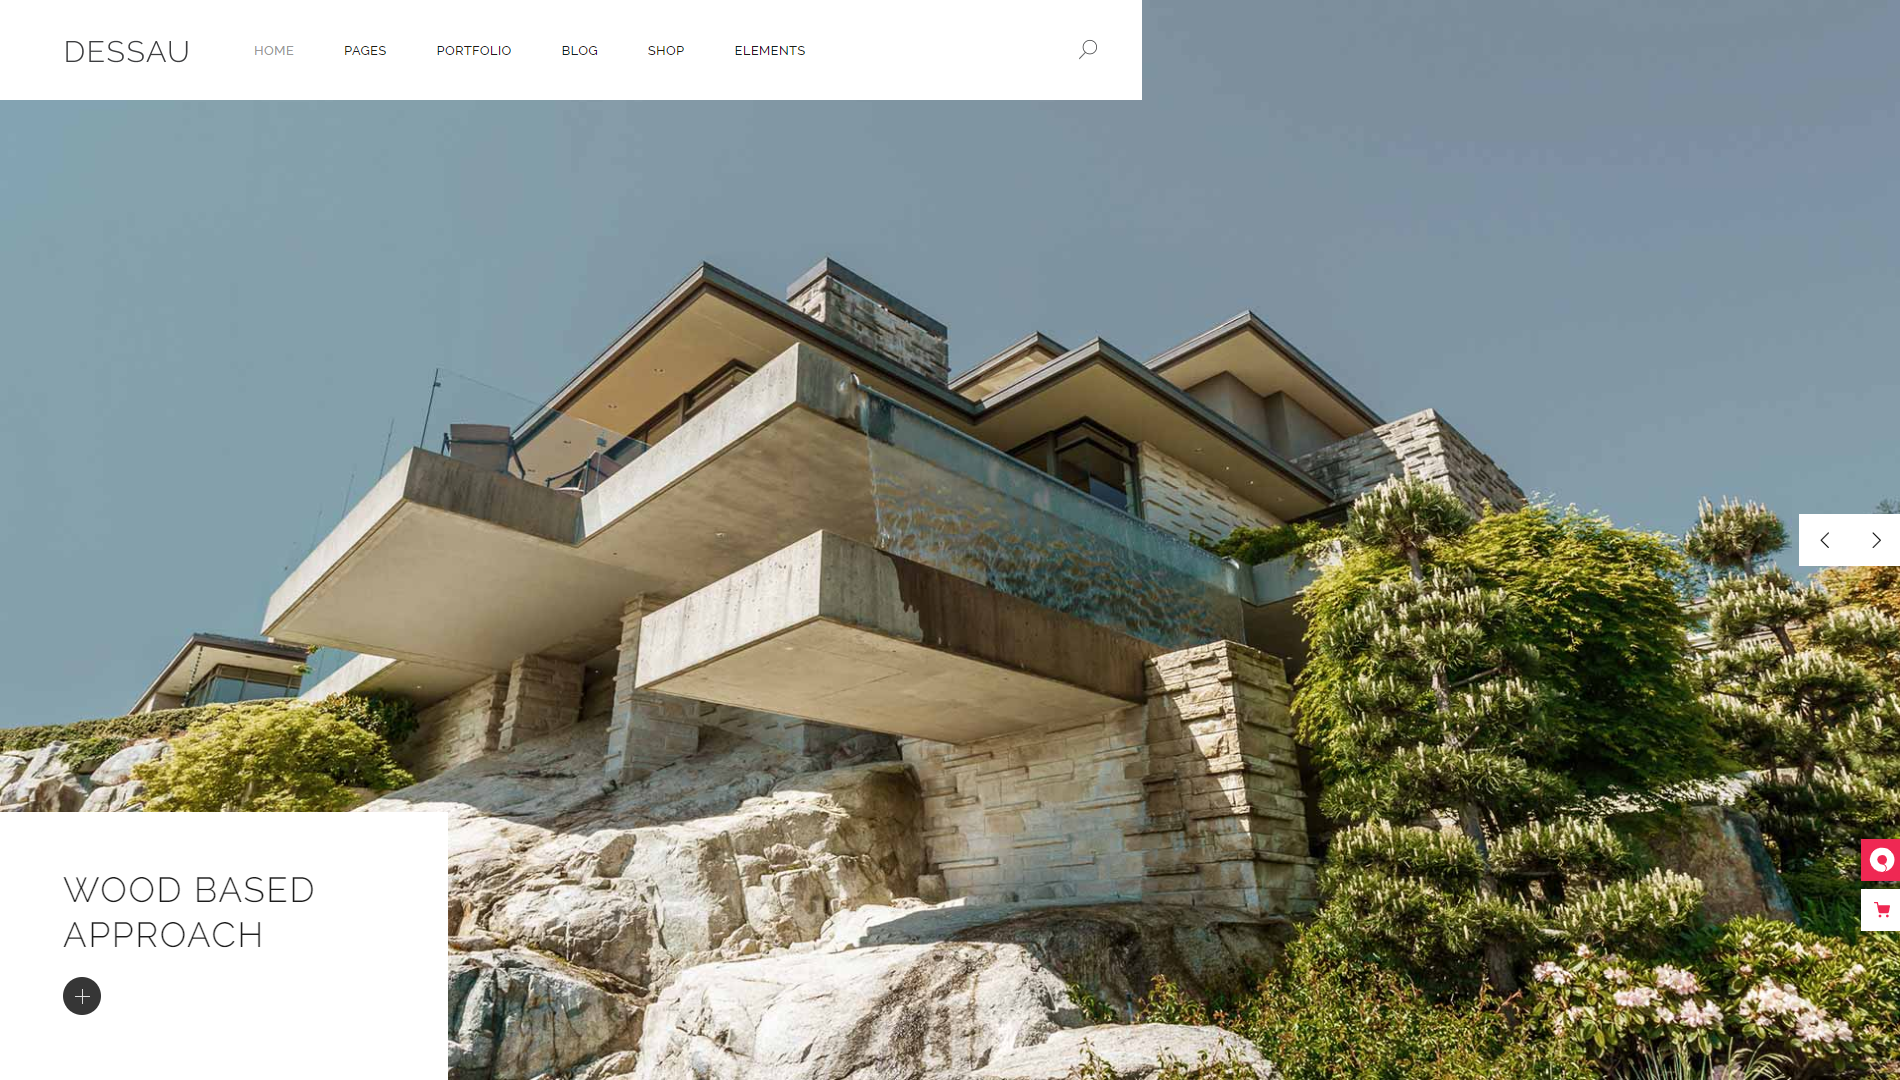 Website Designs For Architecture, Architects, Interior Design, Designers – 20+ Websites & Features